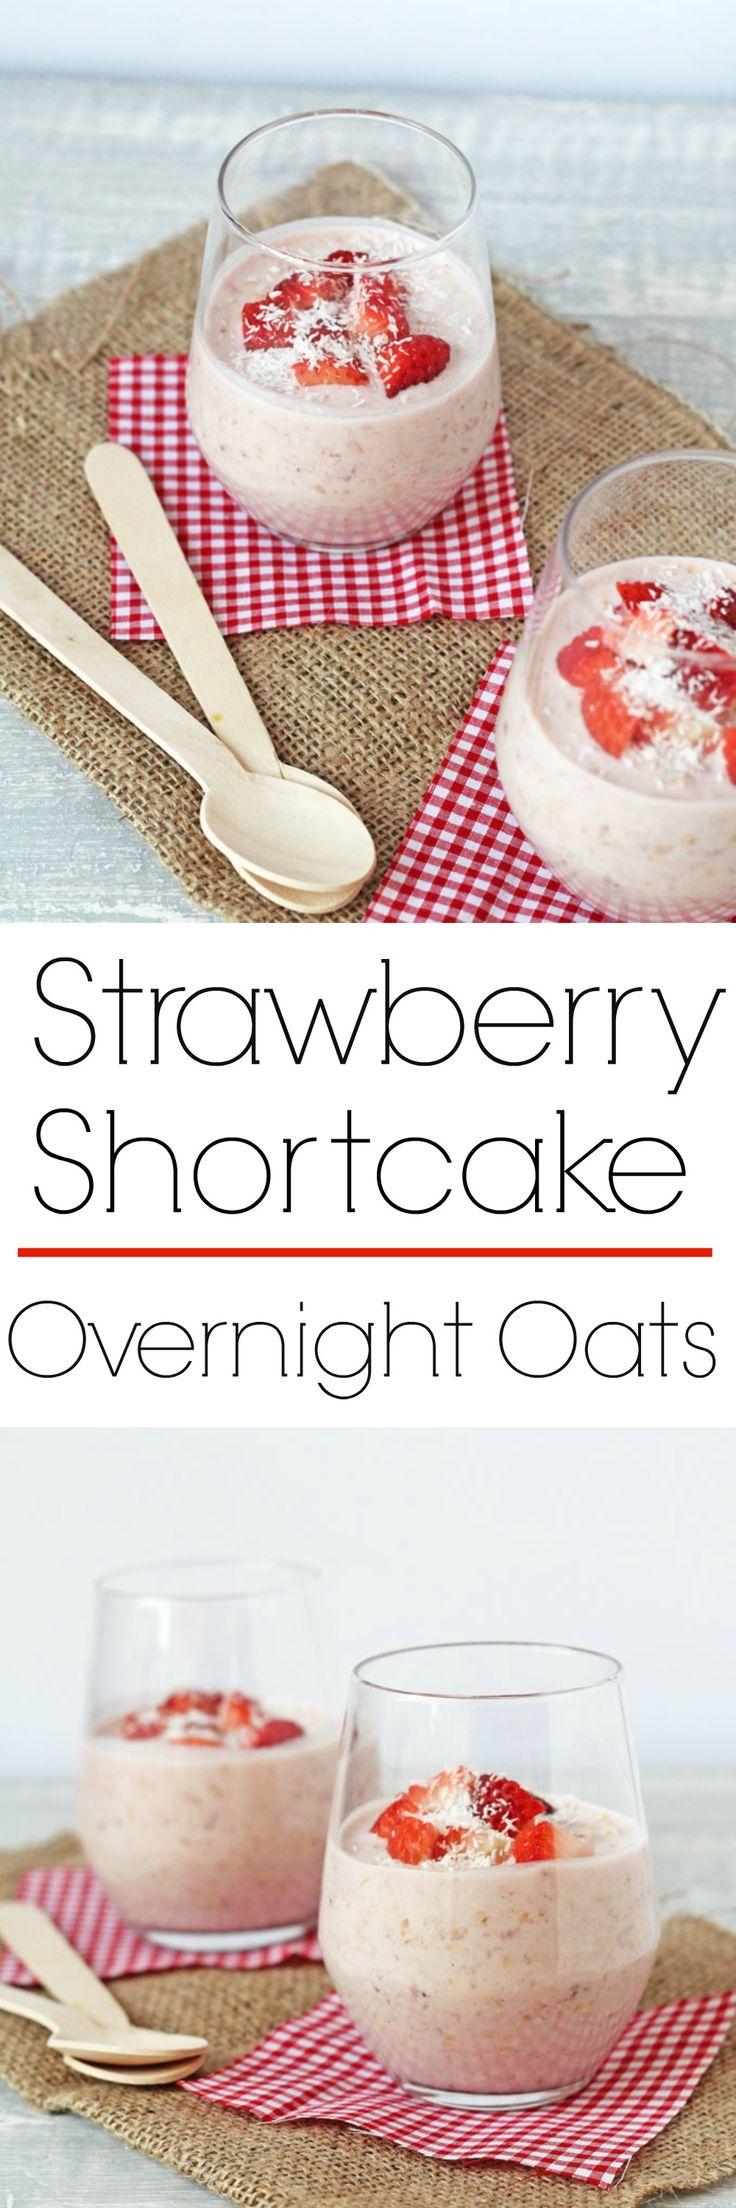 Strawberry Shortcake Overnight Oats Recipe | My Fussy Eater Blog This is sooooo yummy! I added chia seeds to mine.